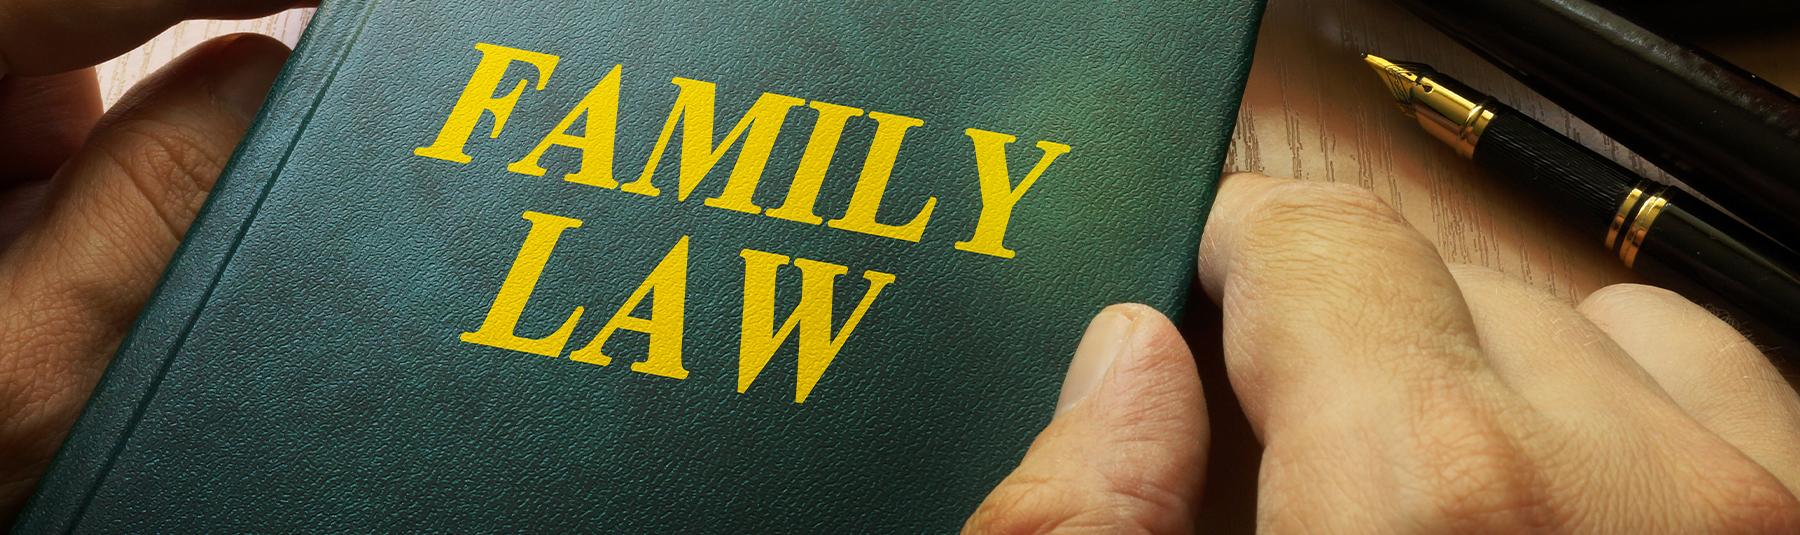 surrogacy law